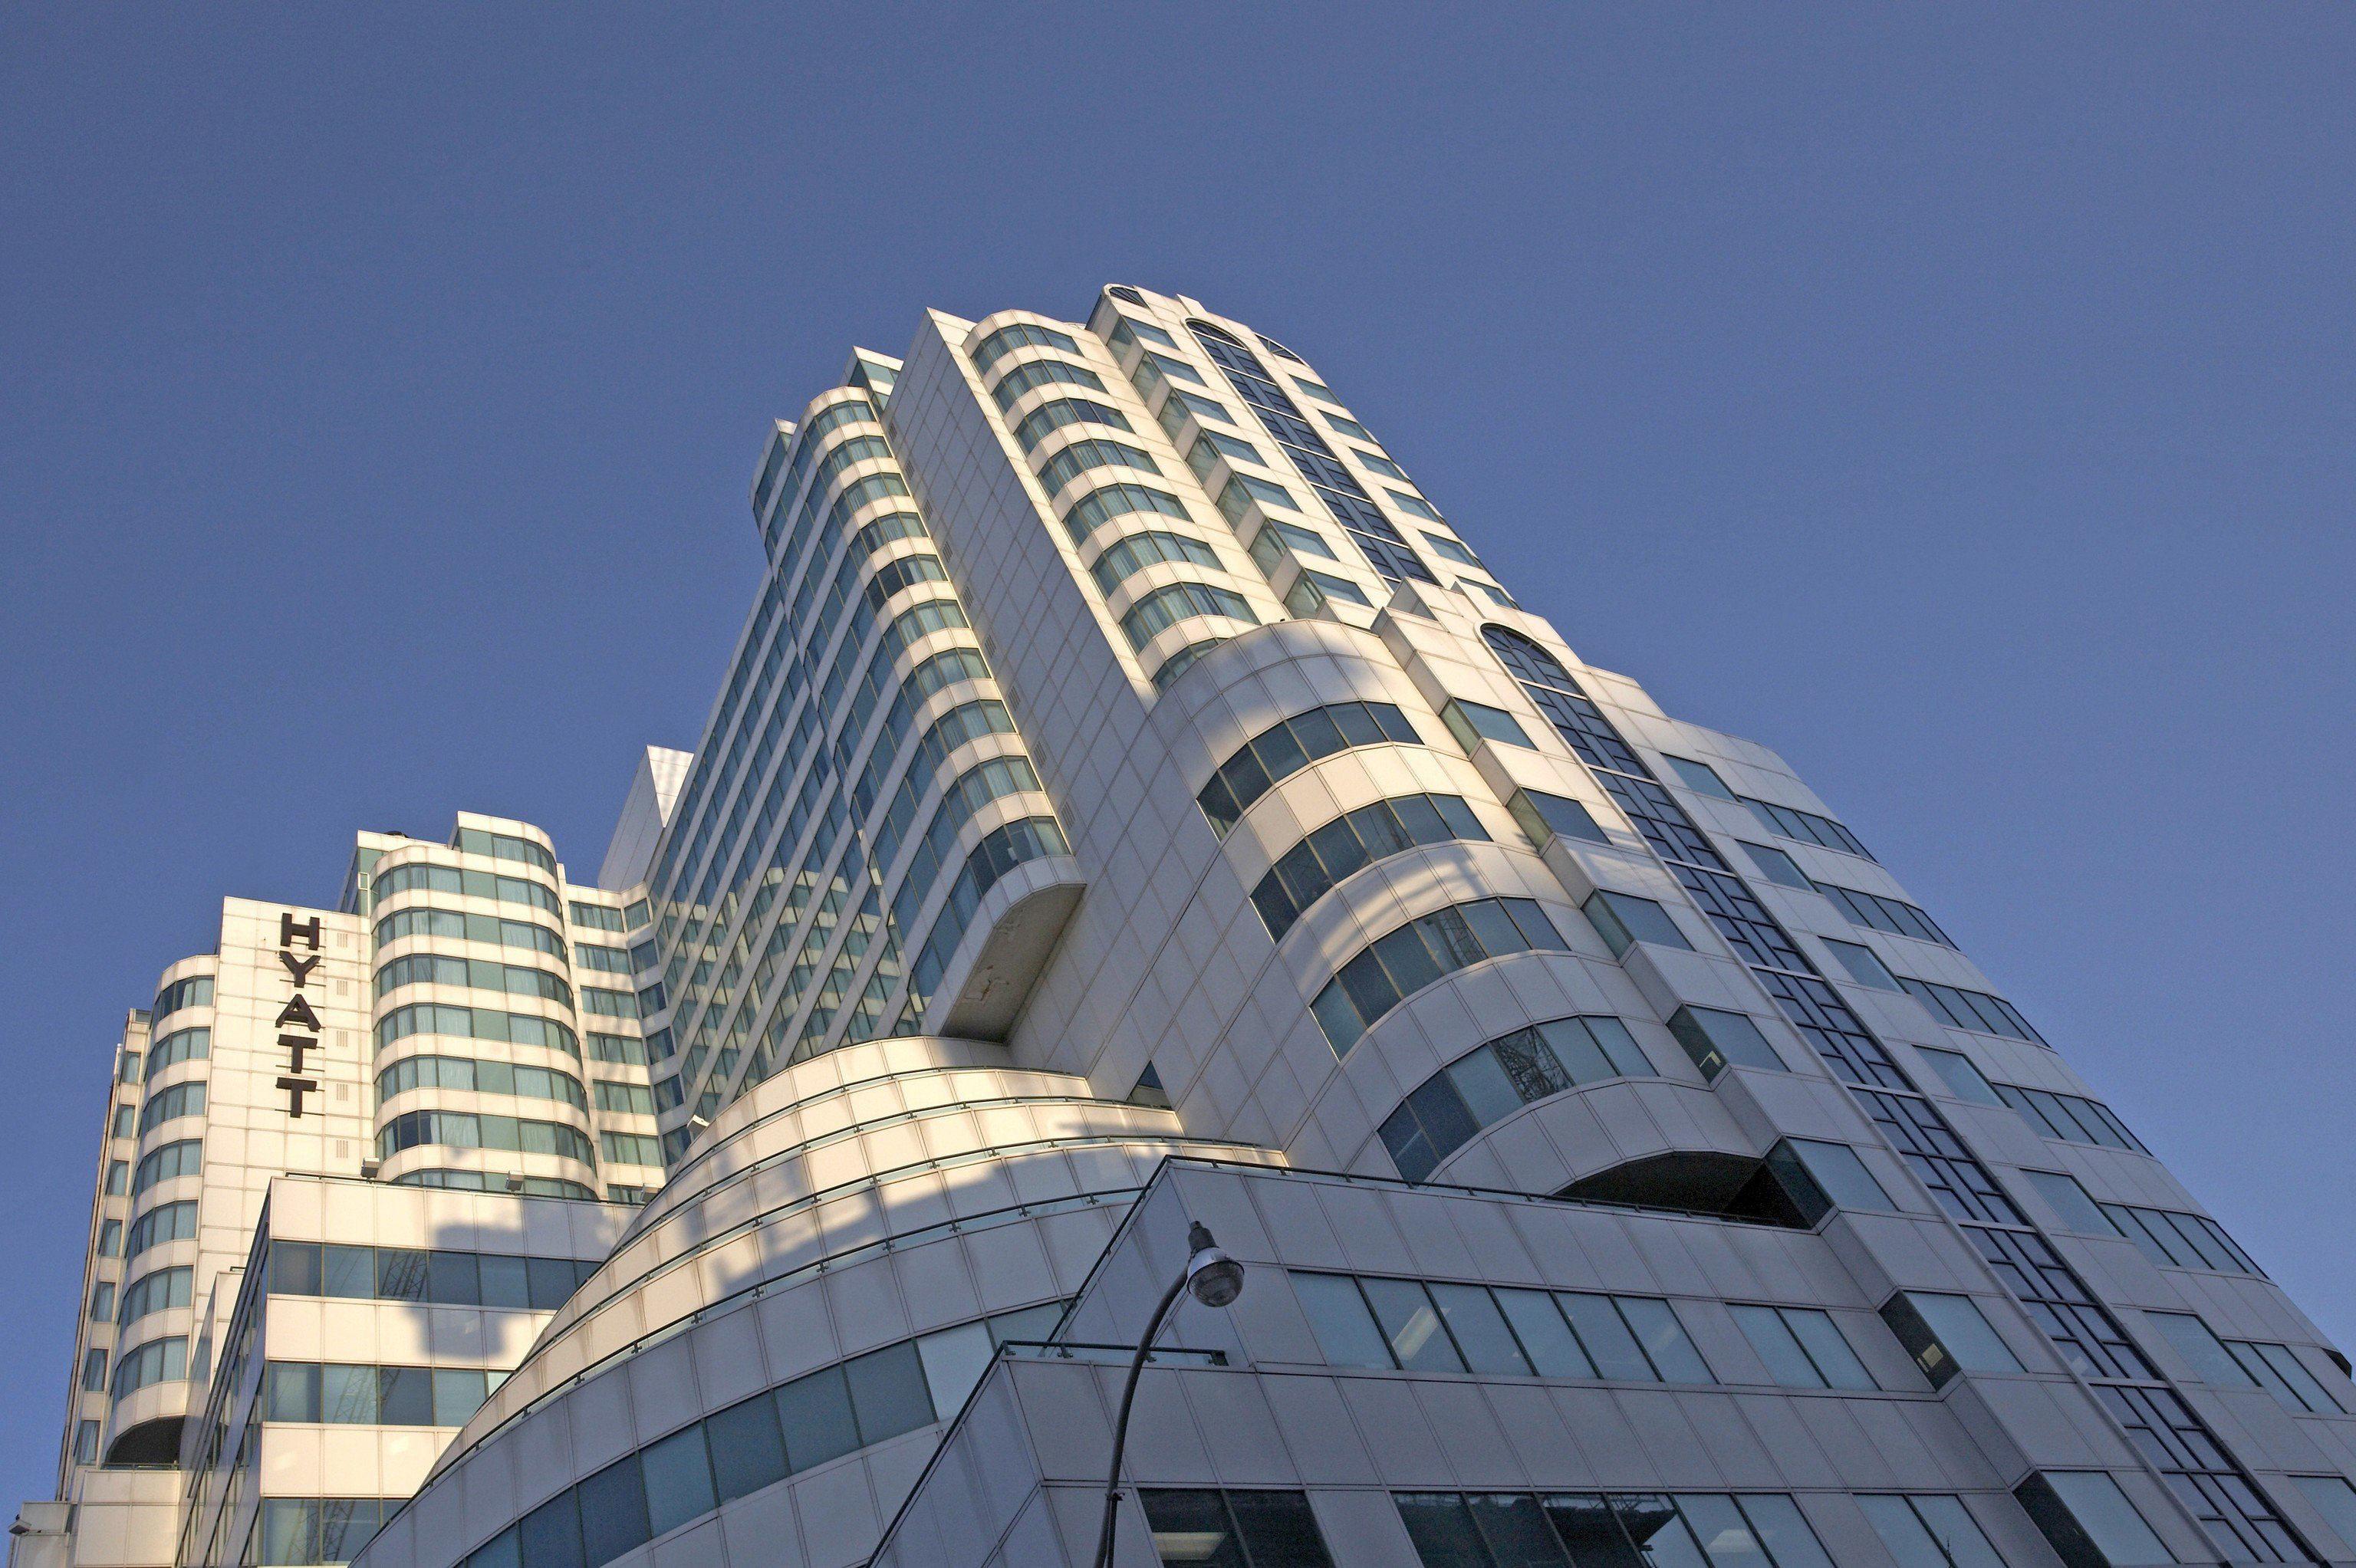 sky building skyscraper tower block landmark metropolitan area City Architecture metropolis Downtown tower headquarters cityscape condominium tall day